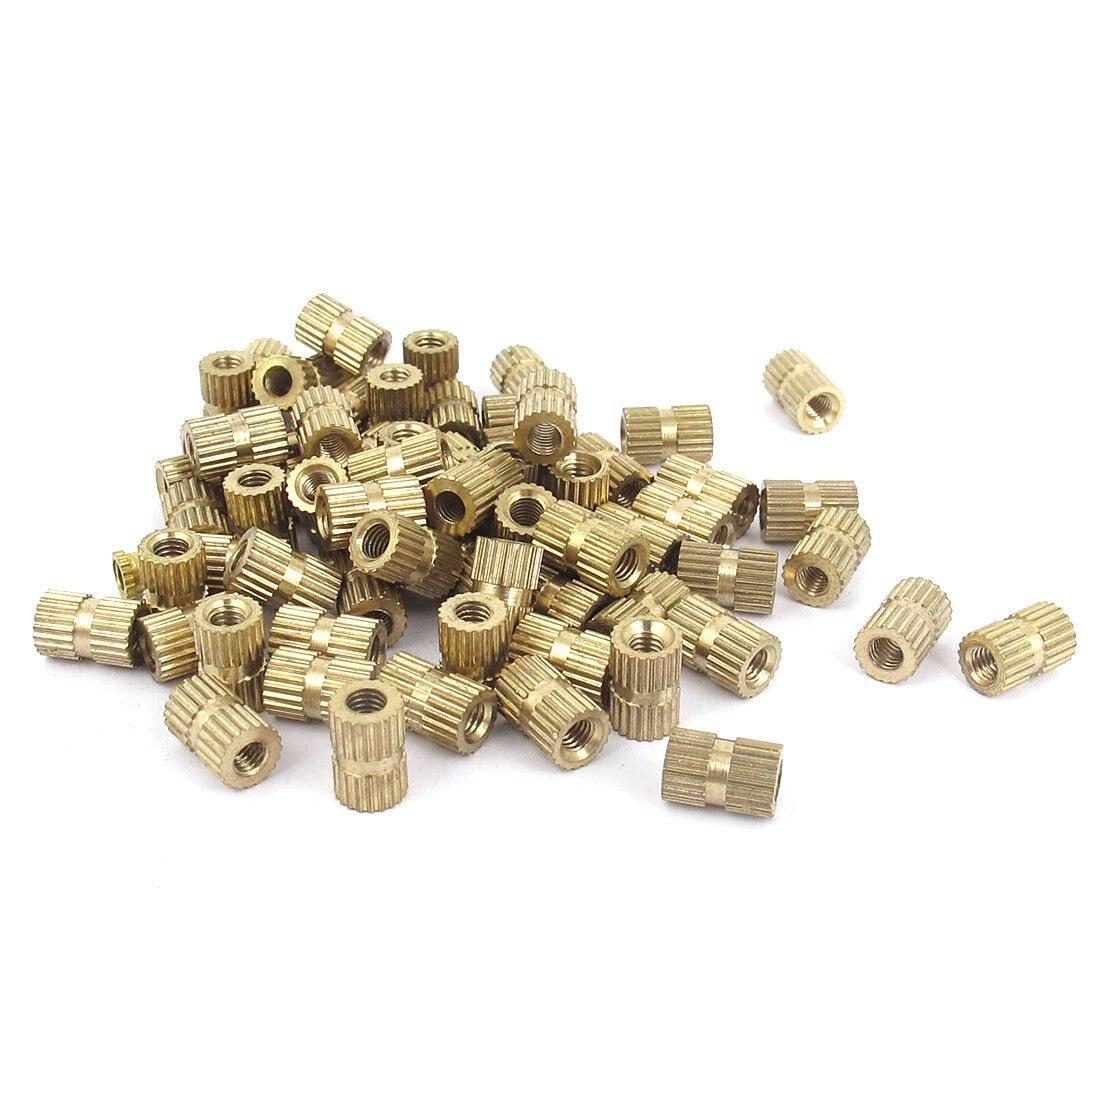 100pcs-m3x8mm-stitching-round-metal-endless-screw-thread-insert-dice-brass-tone